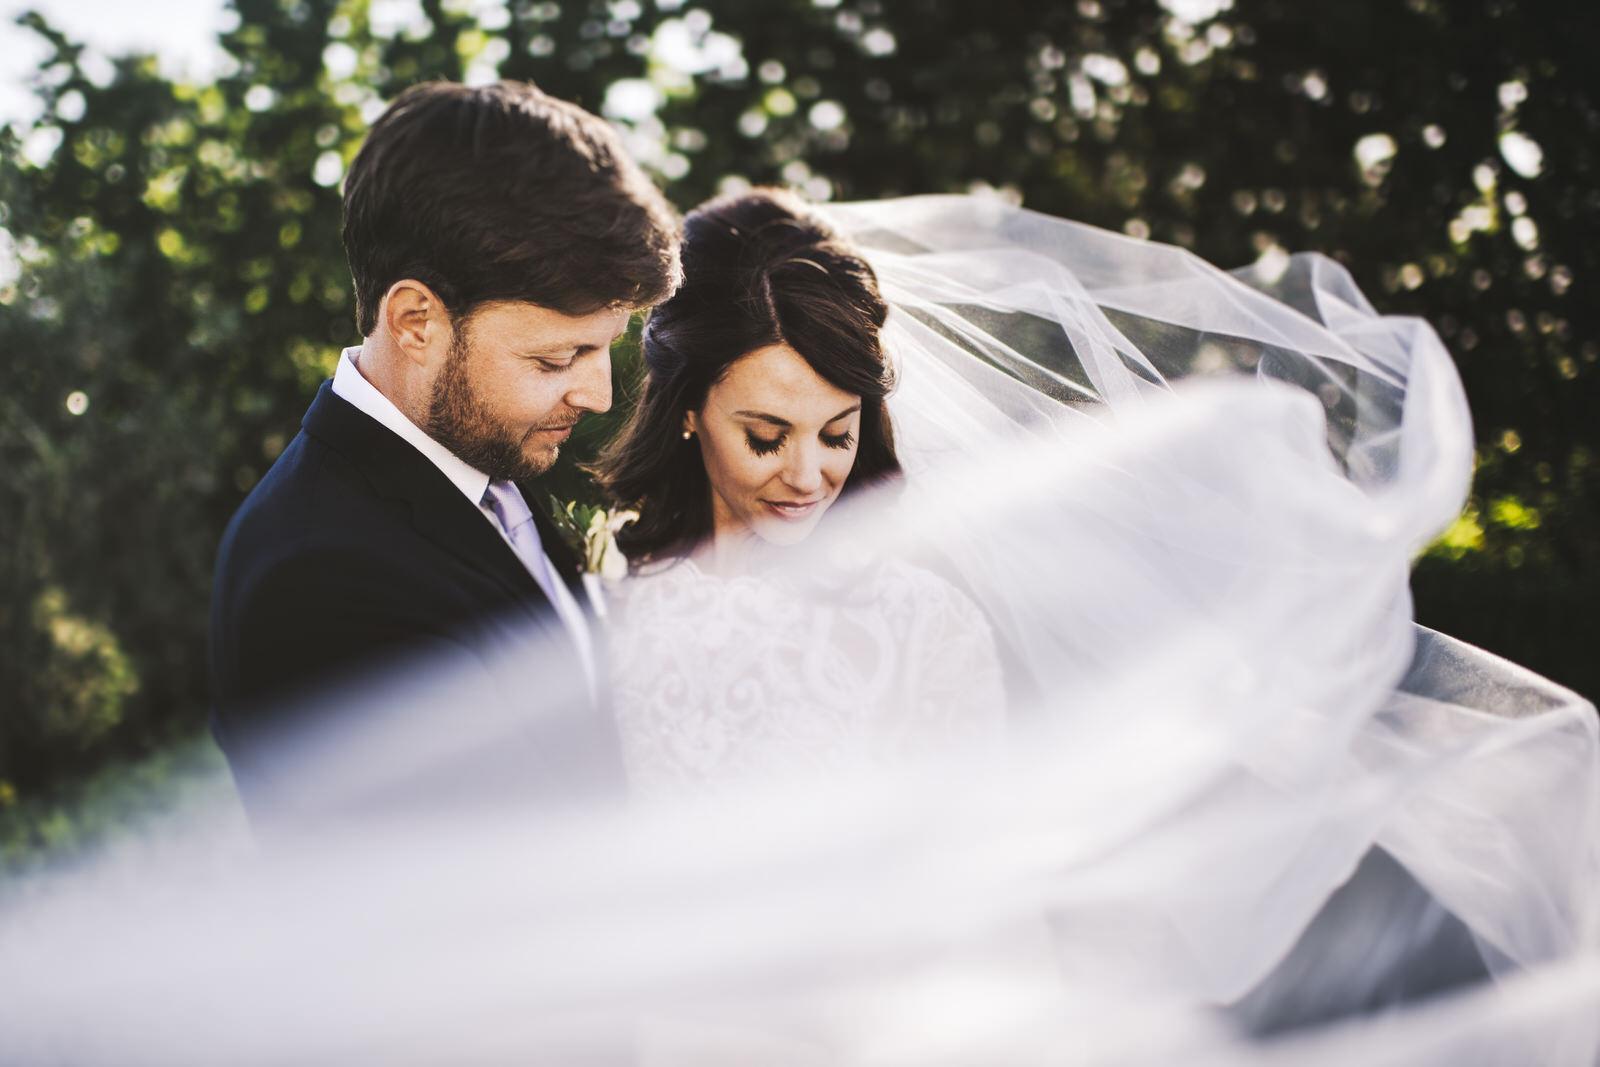 wedding photographer in italy-venice-tuscany-florence-amalfi coast-como lake-villa del balbianello-siena-amalfi-ravello-belmond-villa cimbrone44